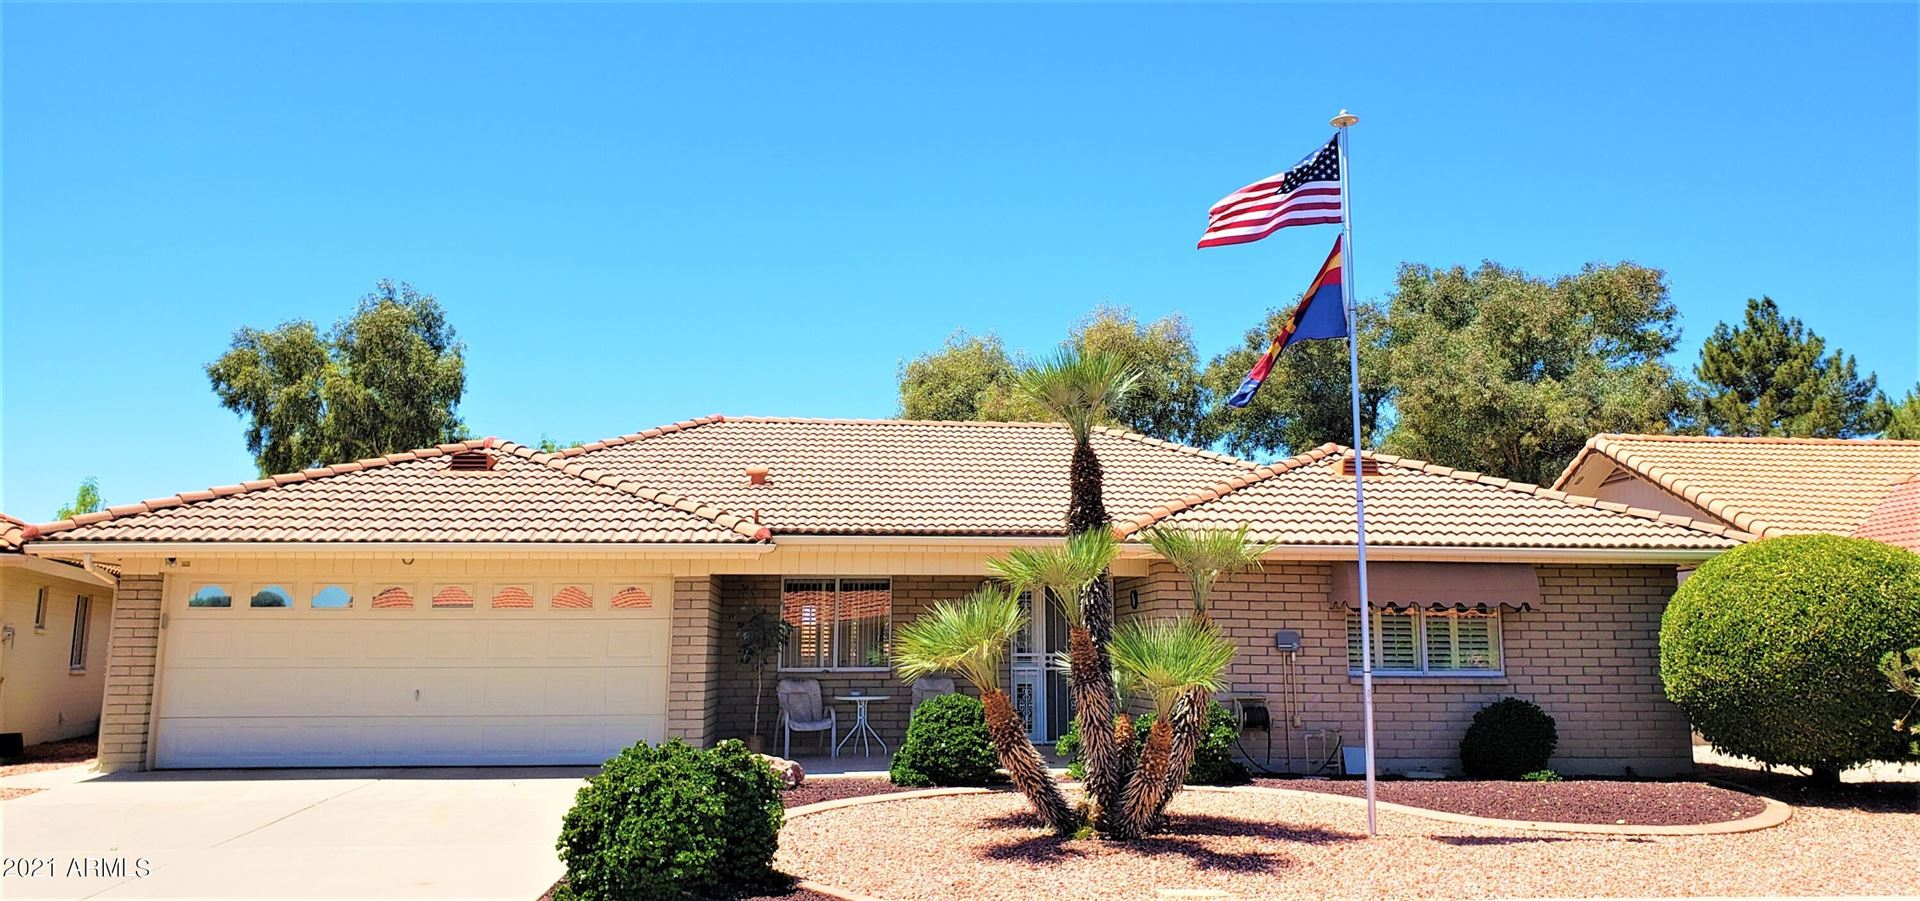 Photo of 2456 S BUTTERCUP --, Mesa, AZ 85209 (MLS # 6232429)